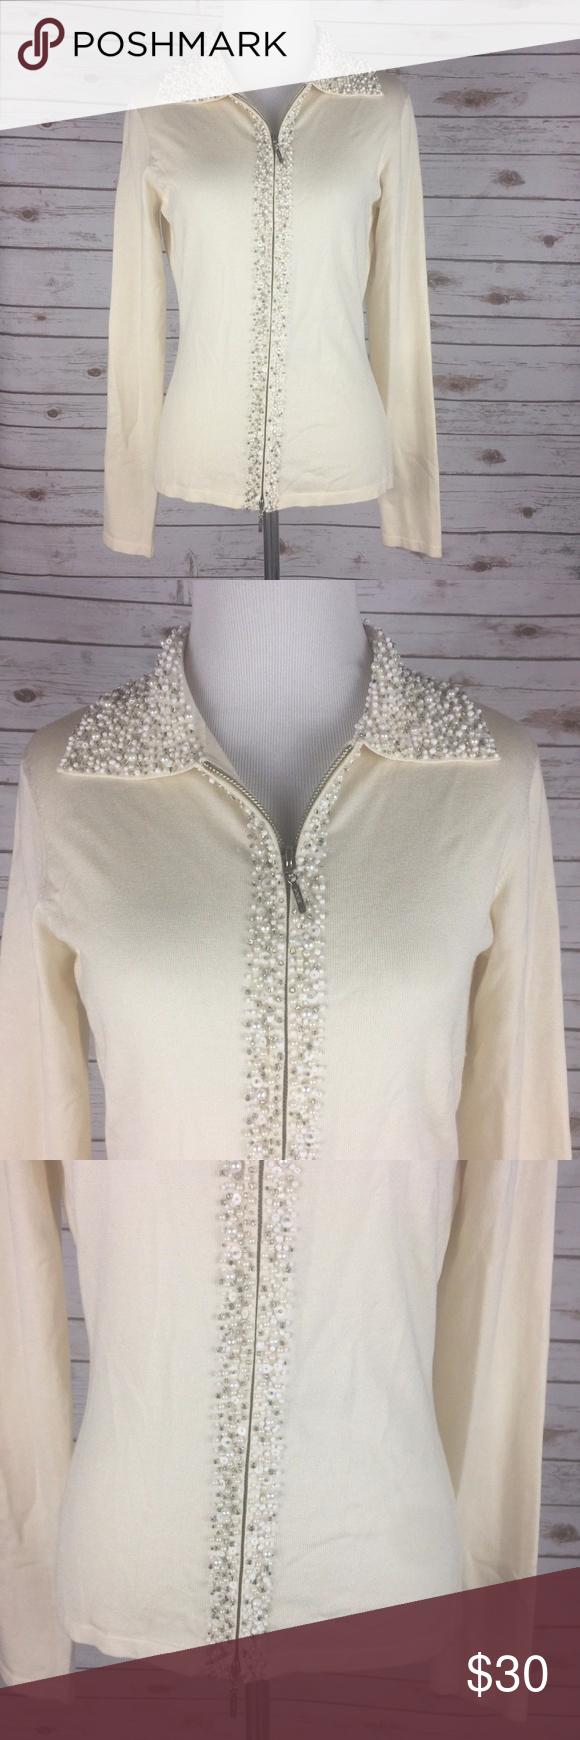 Cache Medium Silk Blend Cream Cardigan Sweater Cache Thin Knit ...